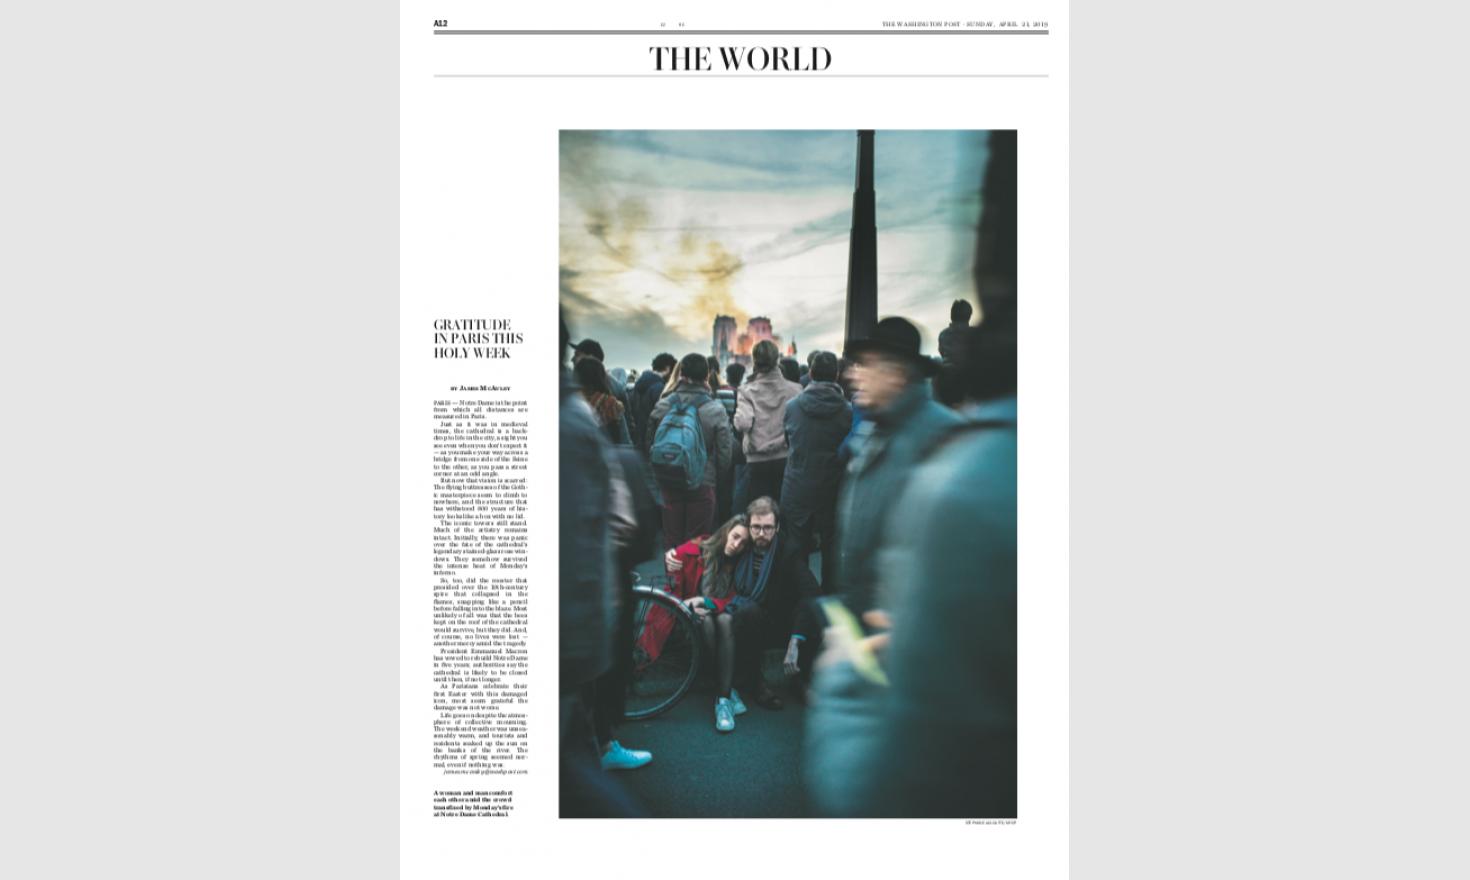 Washington Post, 2019